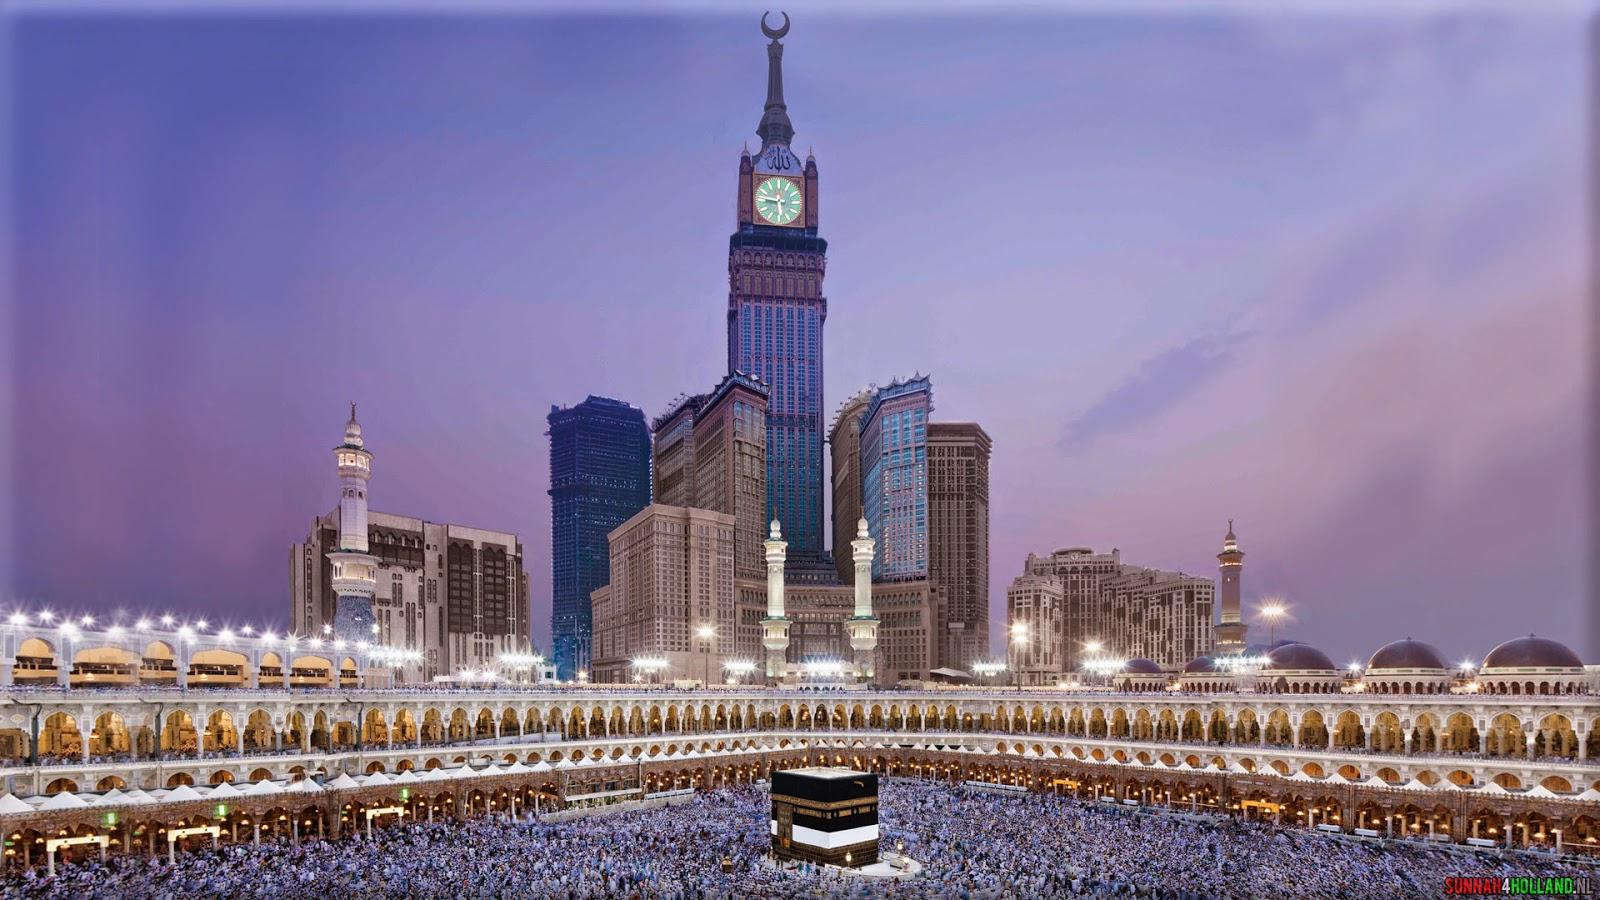 46 Mecca Hd Wallpaper On Wallpapersafari